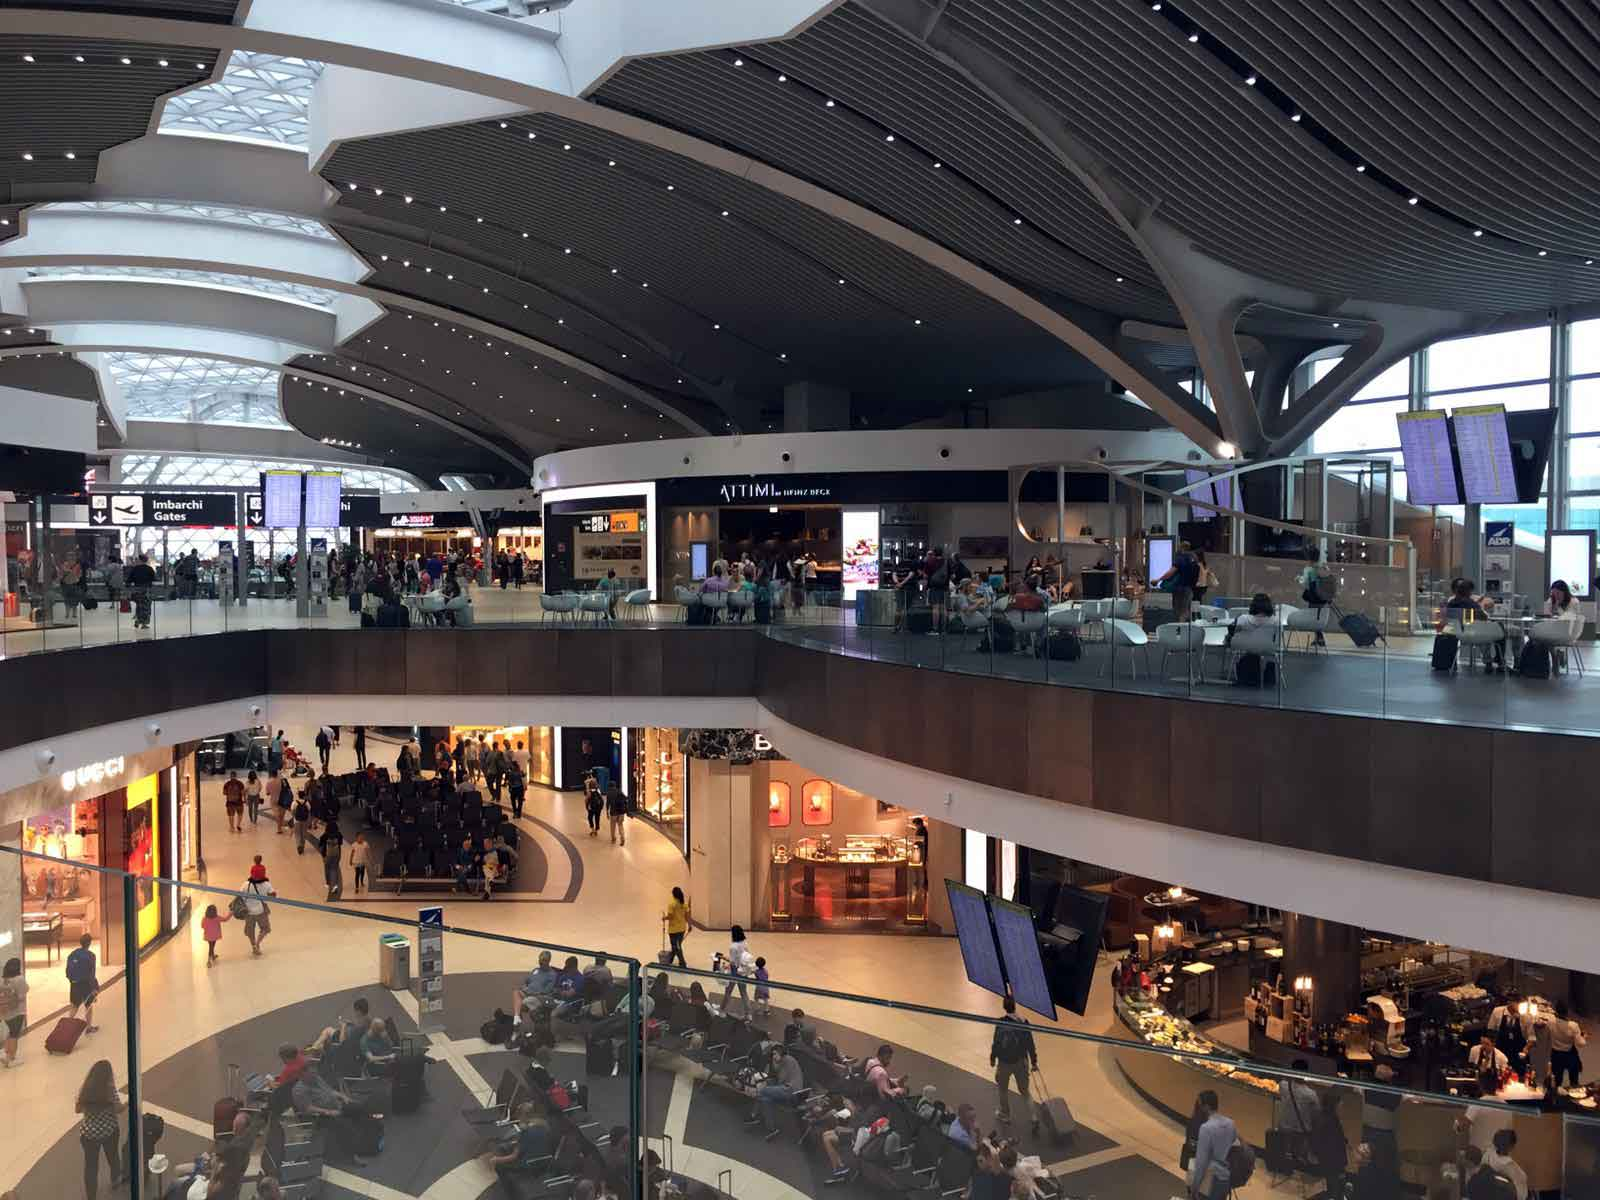 Aeroporto-Fiumicino-Terminal-3